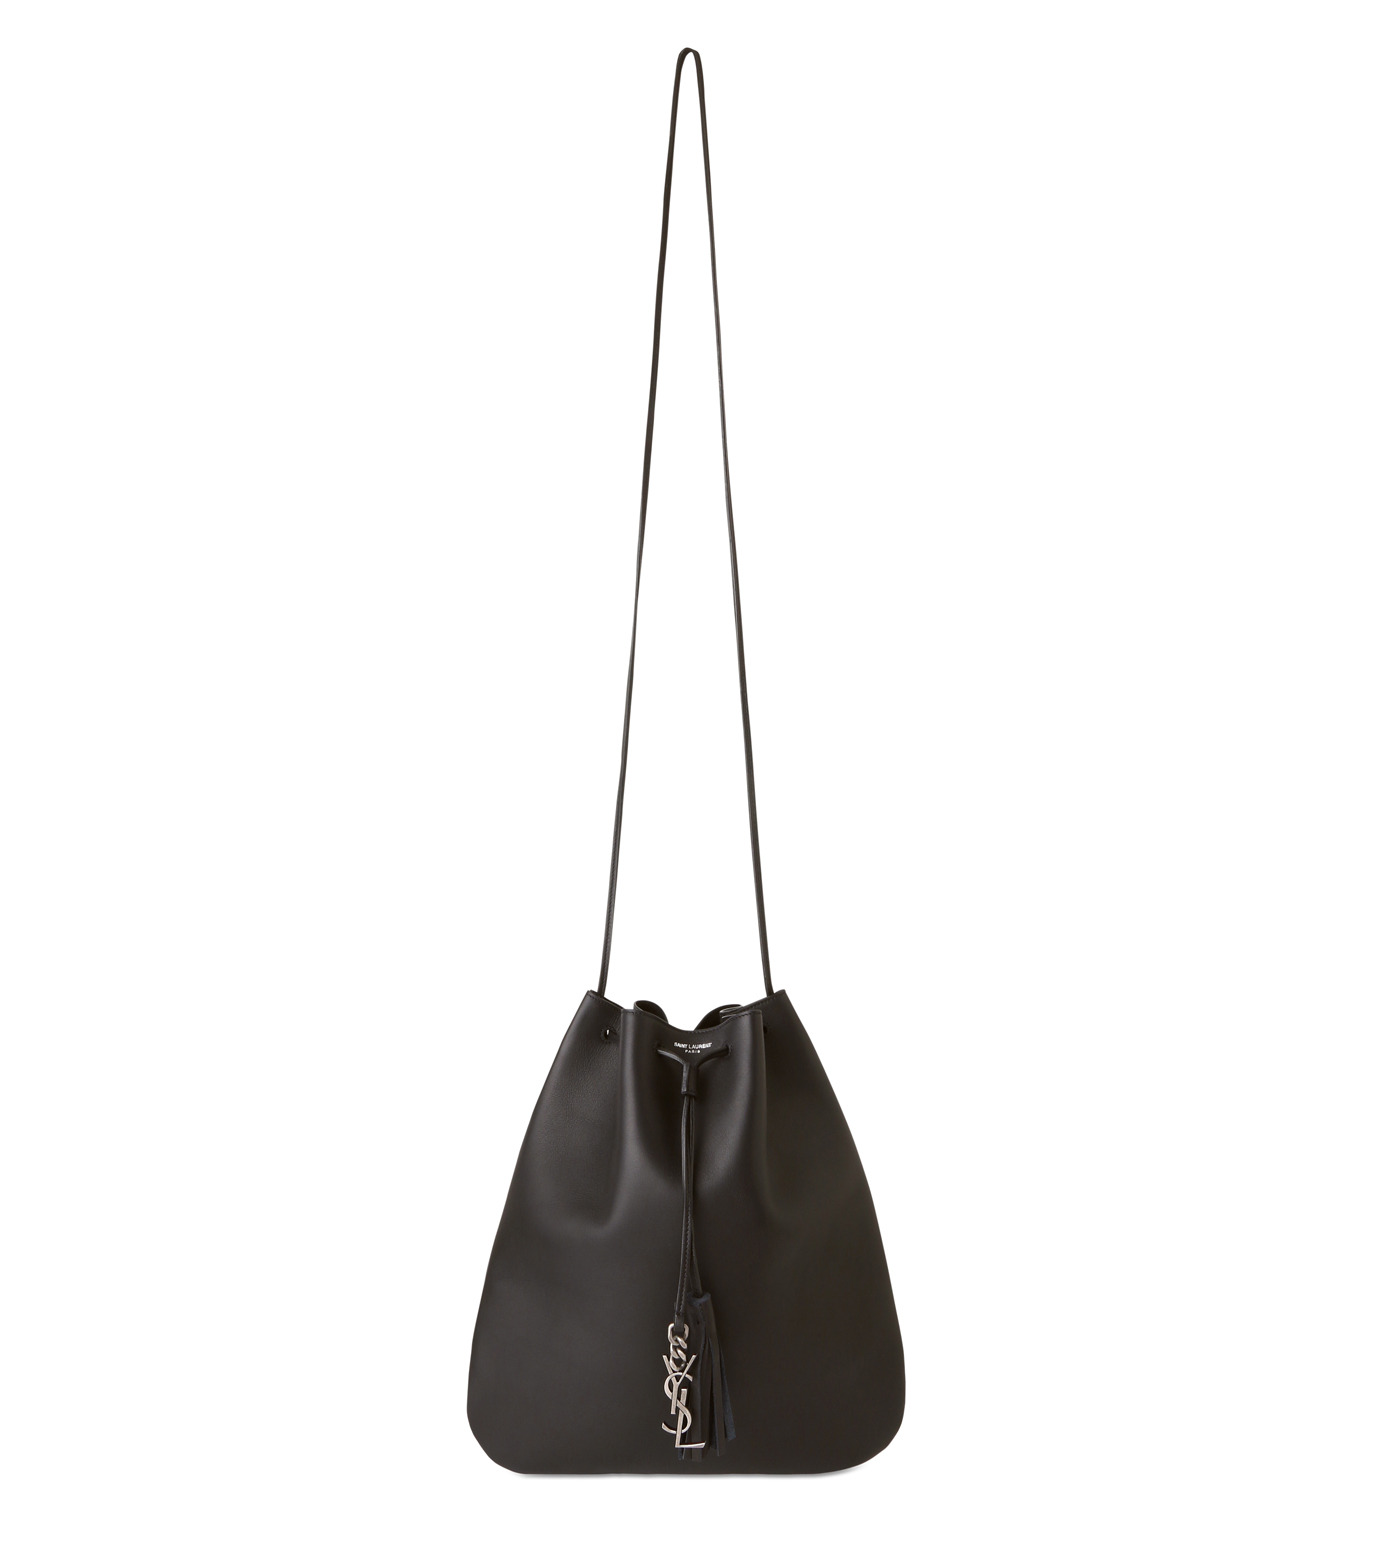 SAINT LAURENT(サンローラン)のJen Medium Flat Bag-BLACK(ショルダーバッグ/shoulder bag)-423874-BJ50D-13 拡大詳細画像1